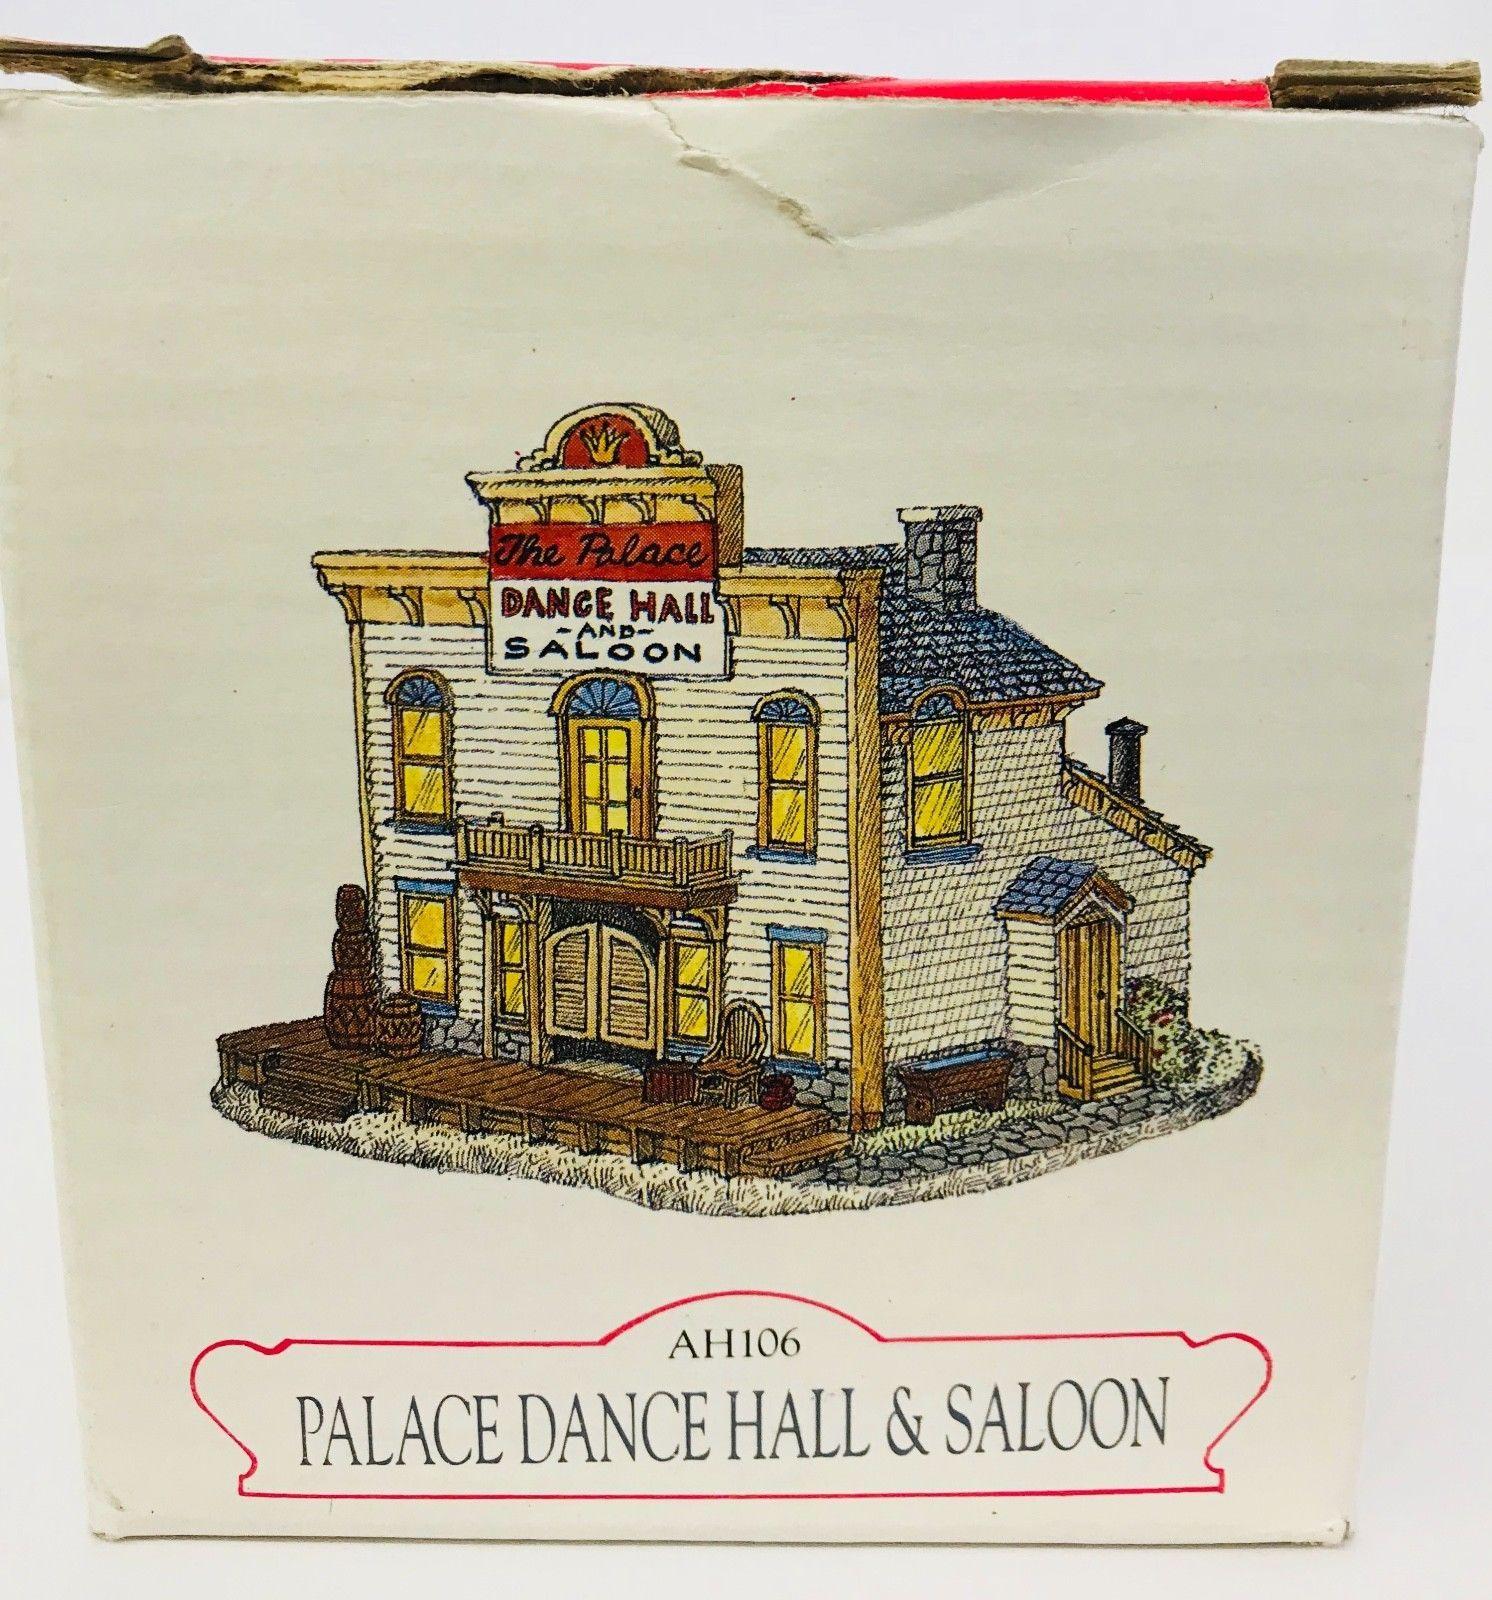 Christmas Village Pieces Lot Of 2 Liberty Falls Palace Dance Hall & Port Jeweler